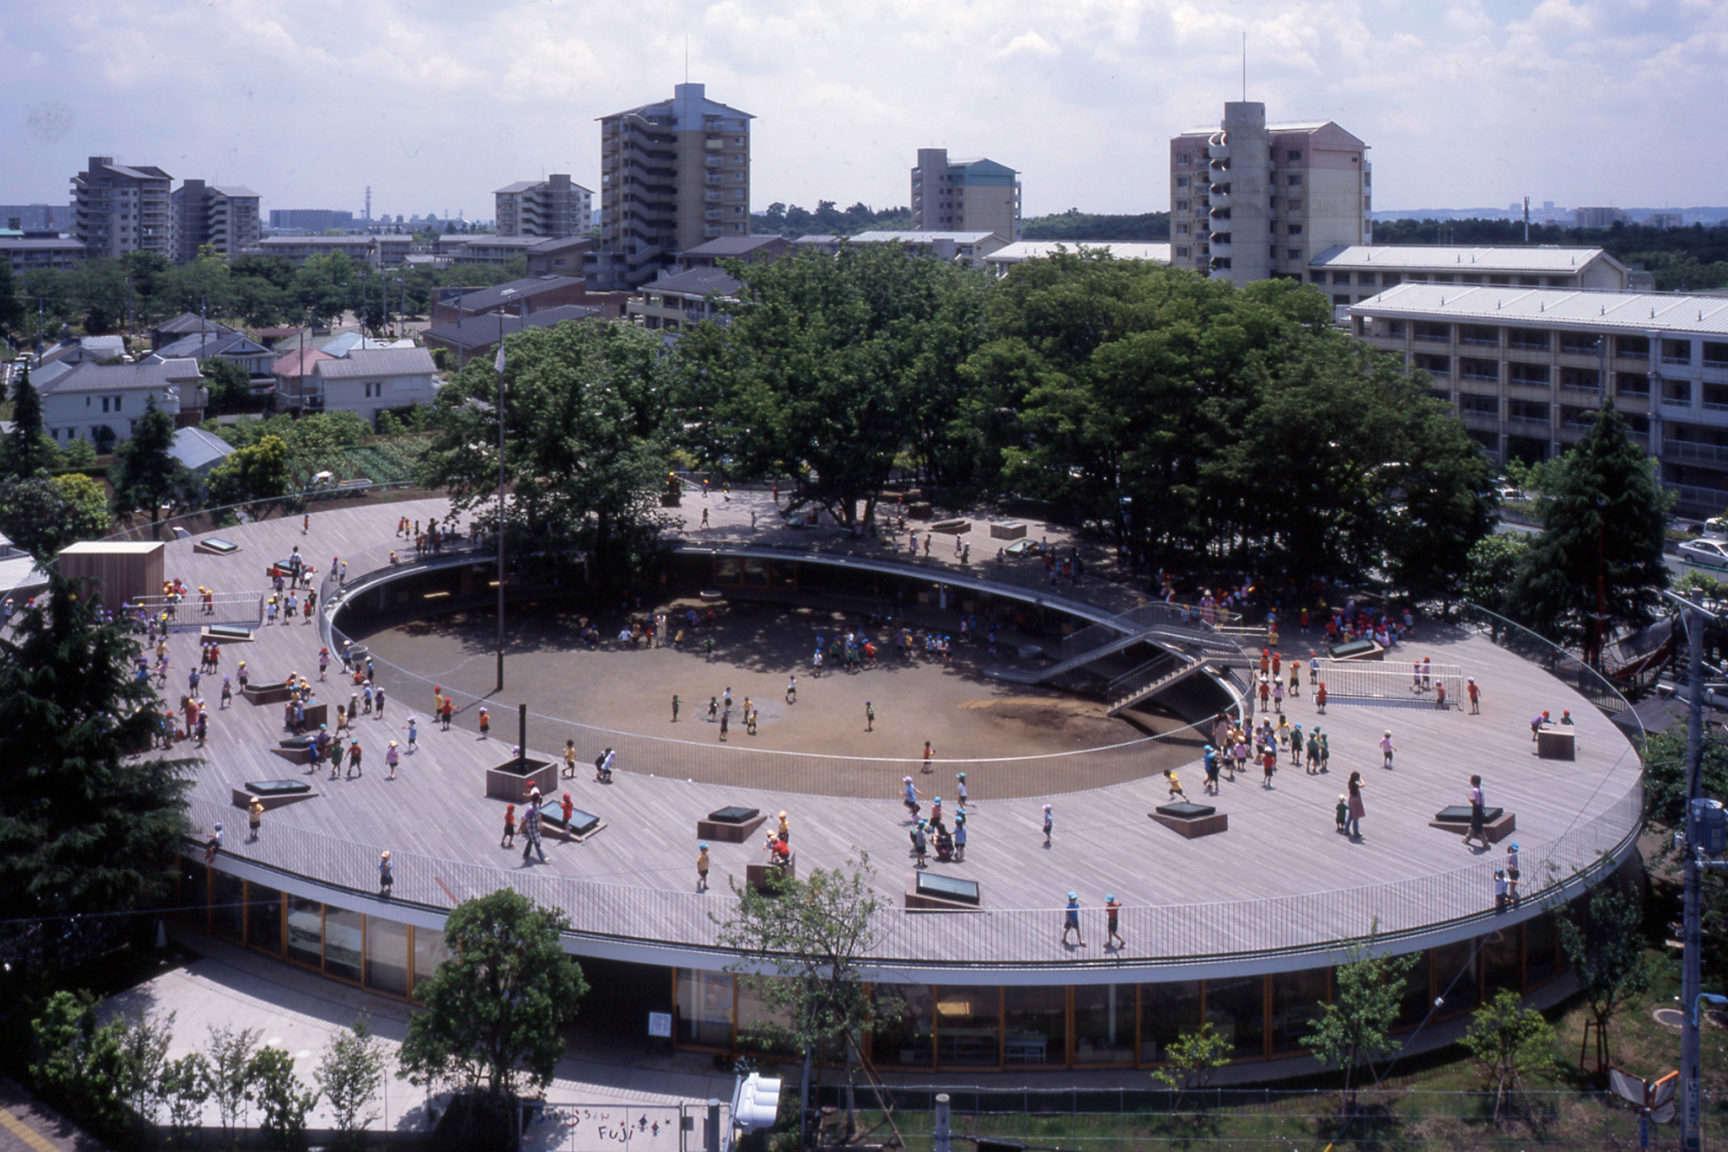 Fuji Kindergarten Roof Deck by Tezuka Architects